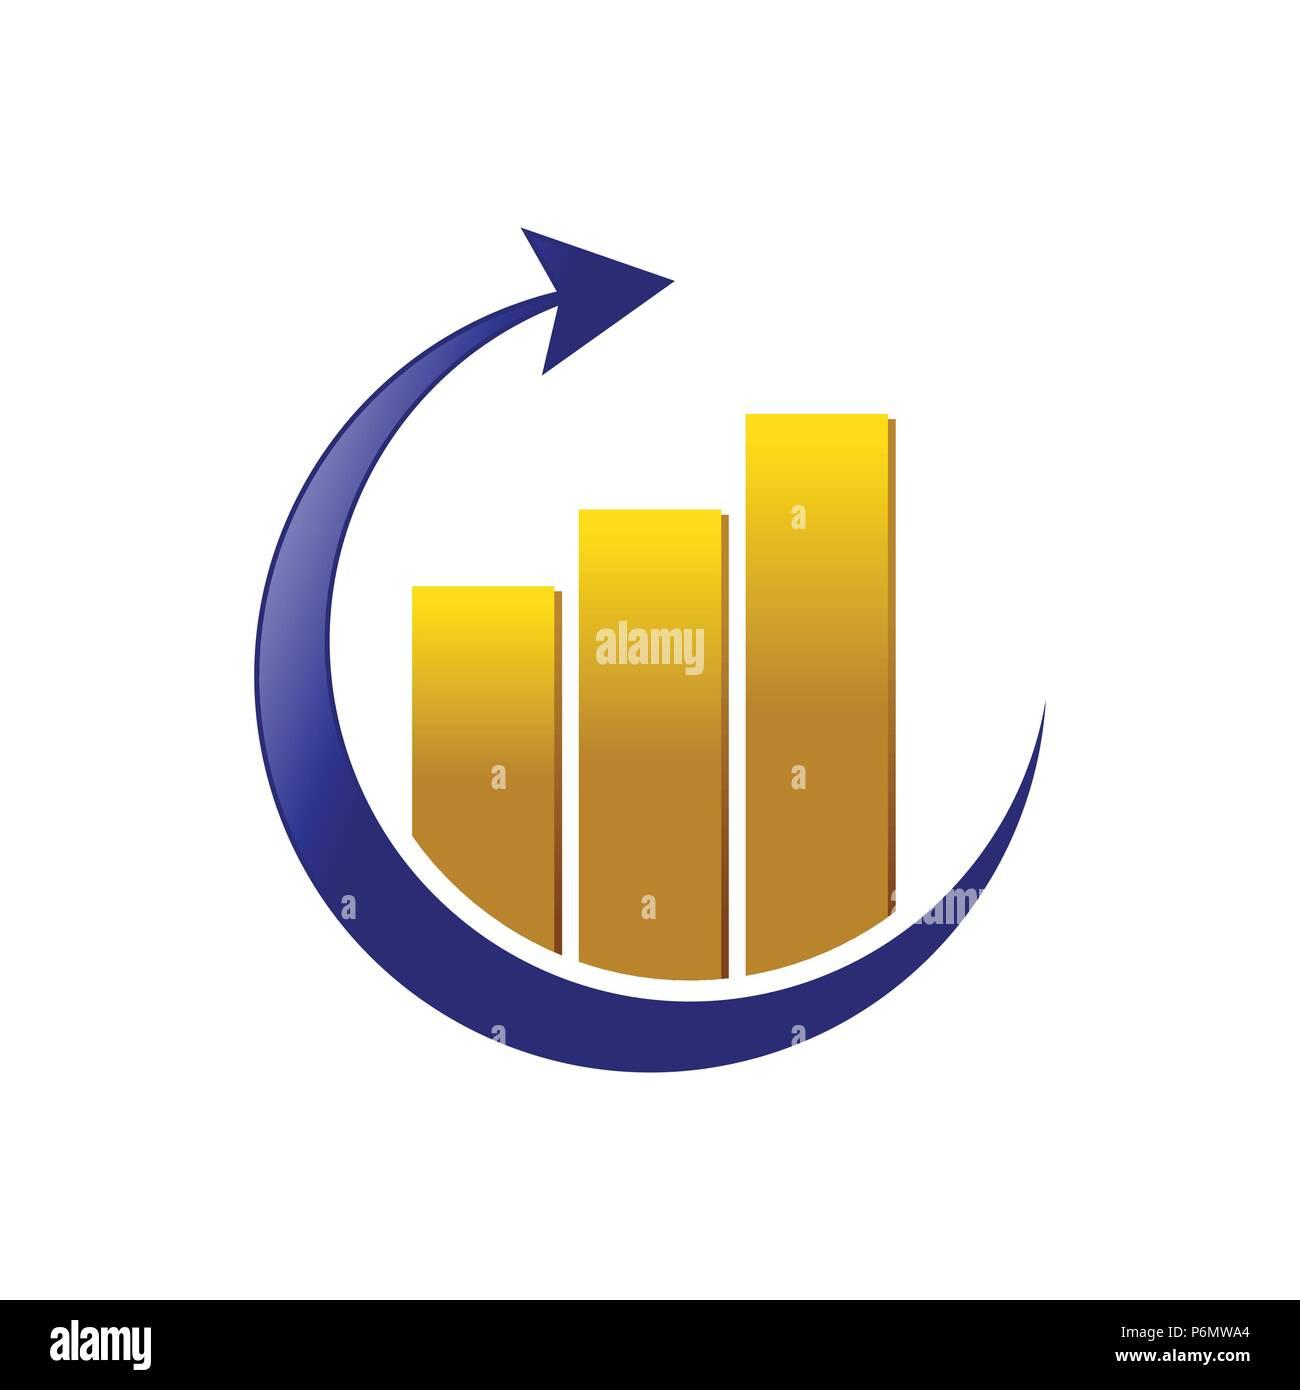 Golden Global Marketing Statistic Vector Symbol Graphic Logo Design - Stock Image